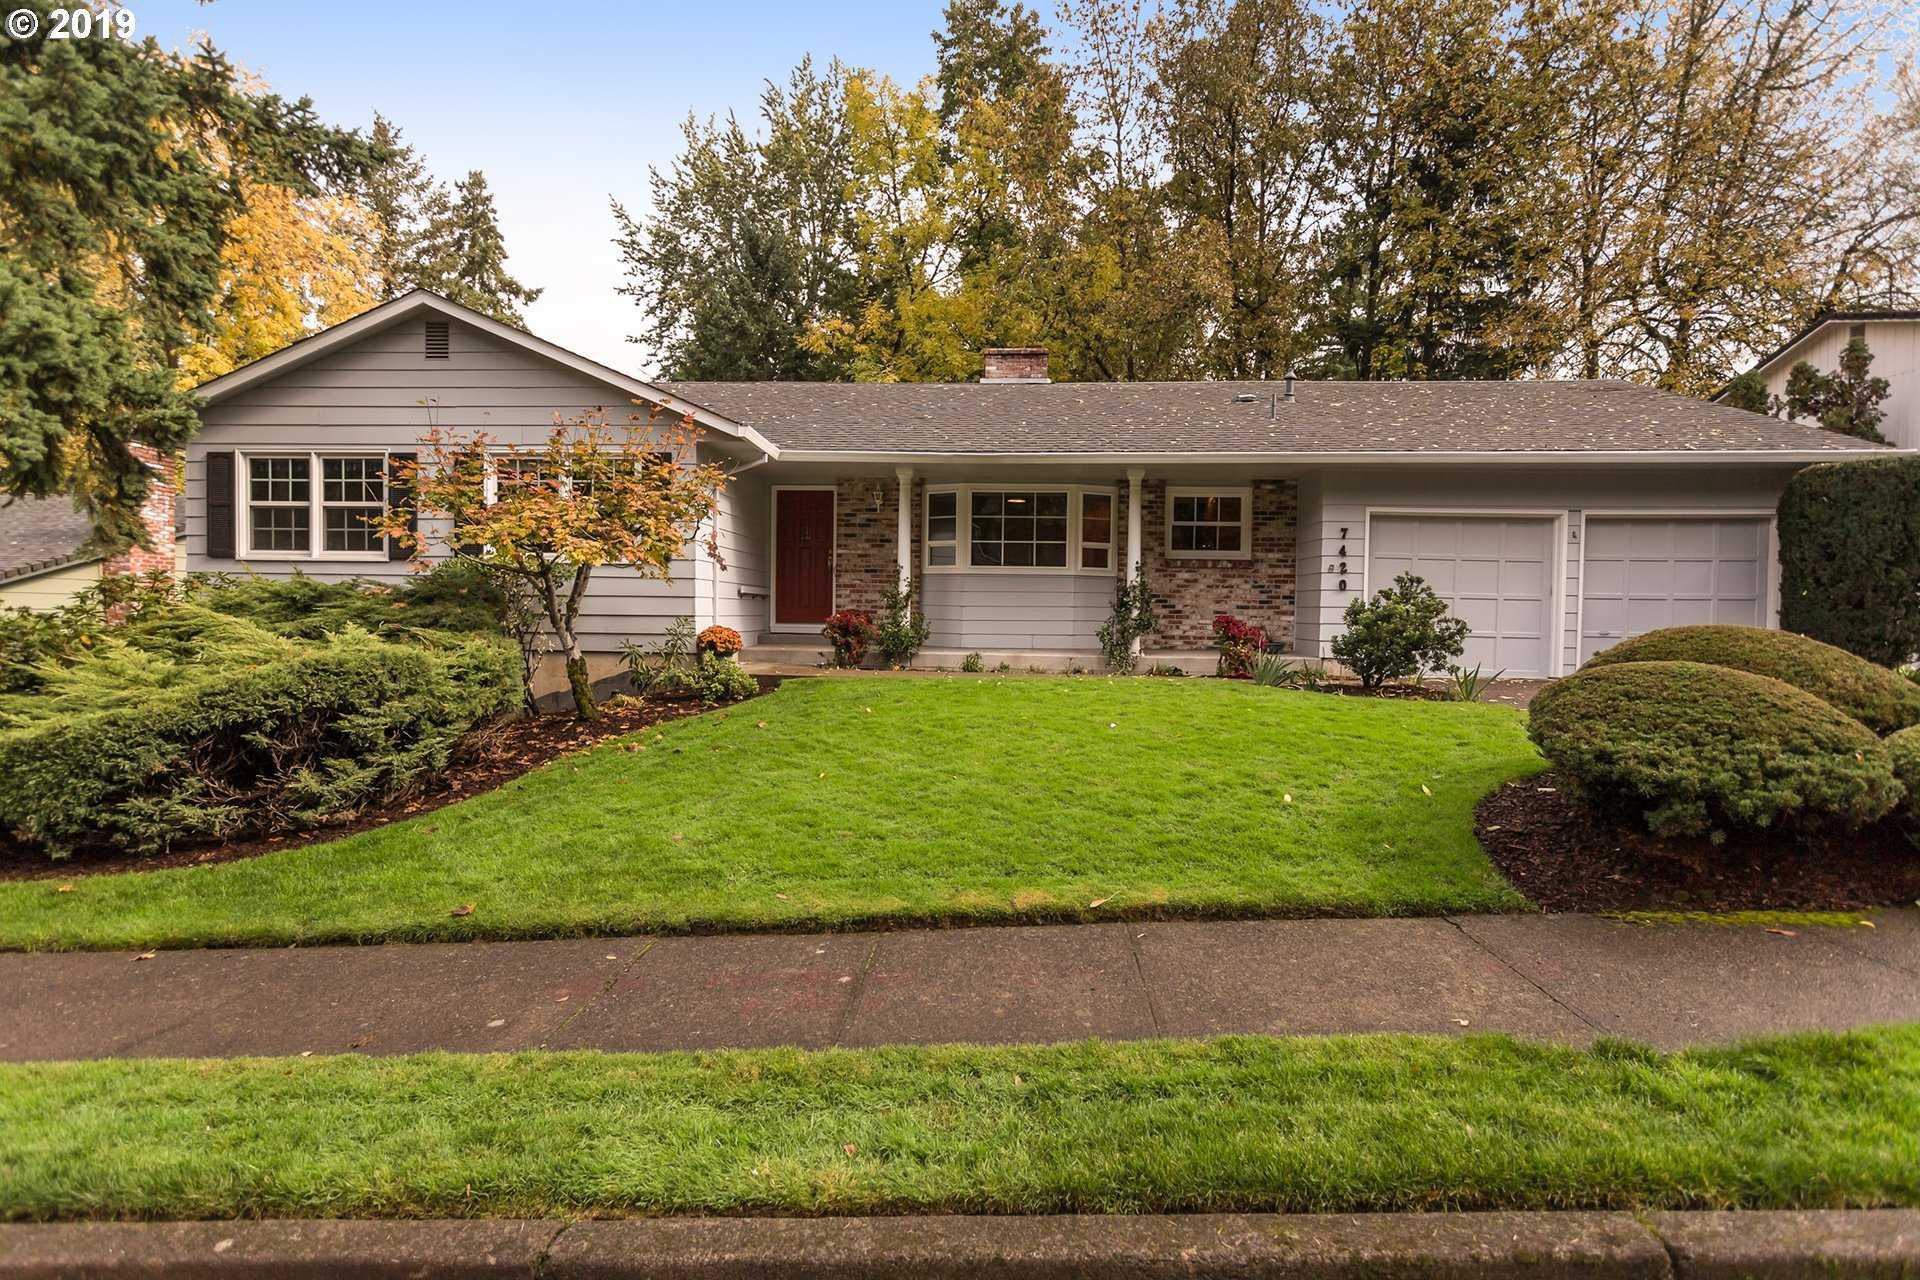 $559,950 - 5Br/3Ba - for Sale in Hyland Hills, Beaverton